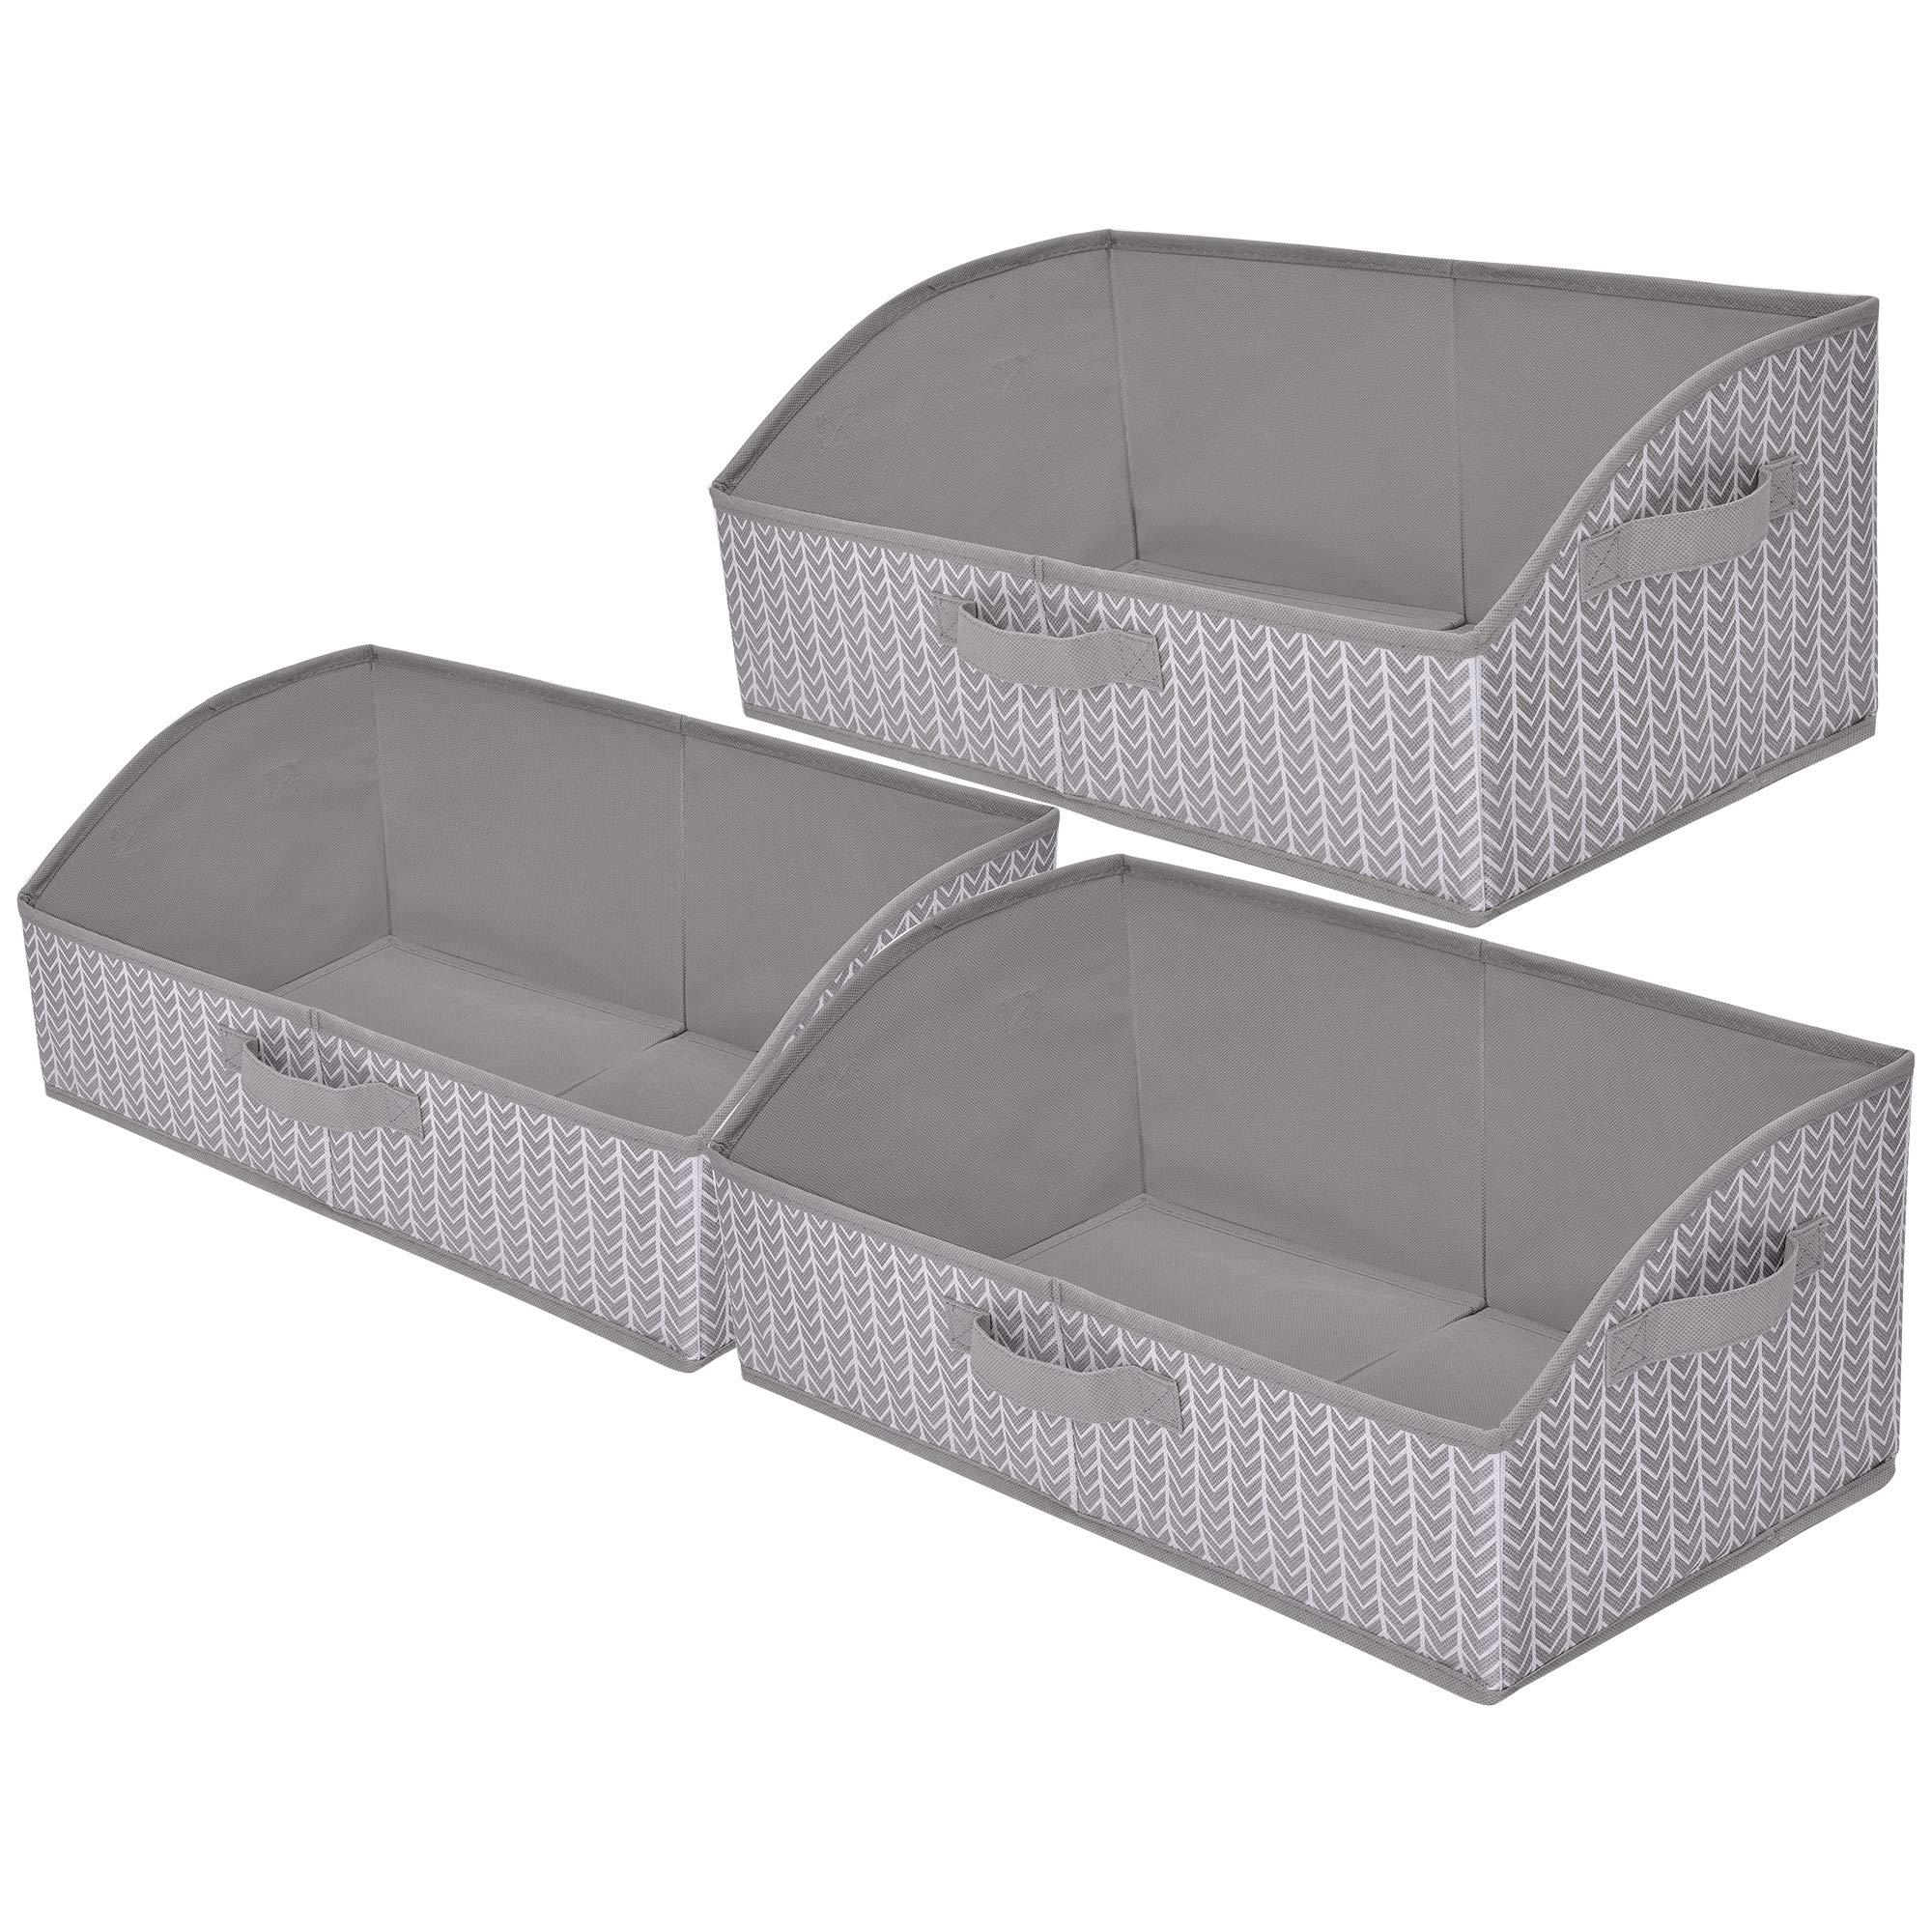 GRANNY SAYS Storage Bins, Closet Organizer Bins,Foldable Closet Organizer Trapezoid Storage Box,Gray/White, 3-Pack by GRANNY SAYS